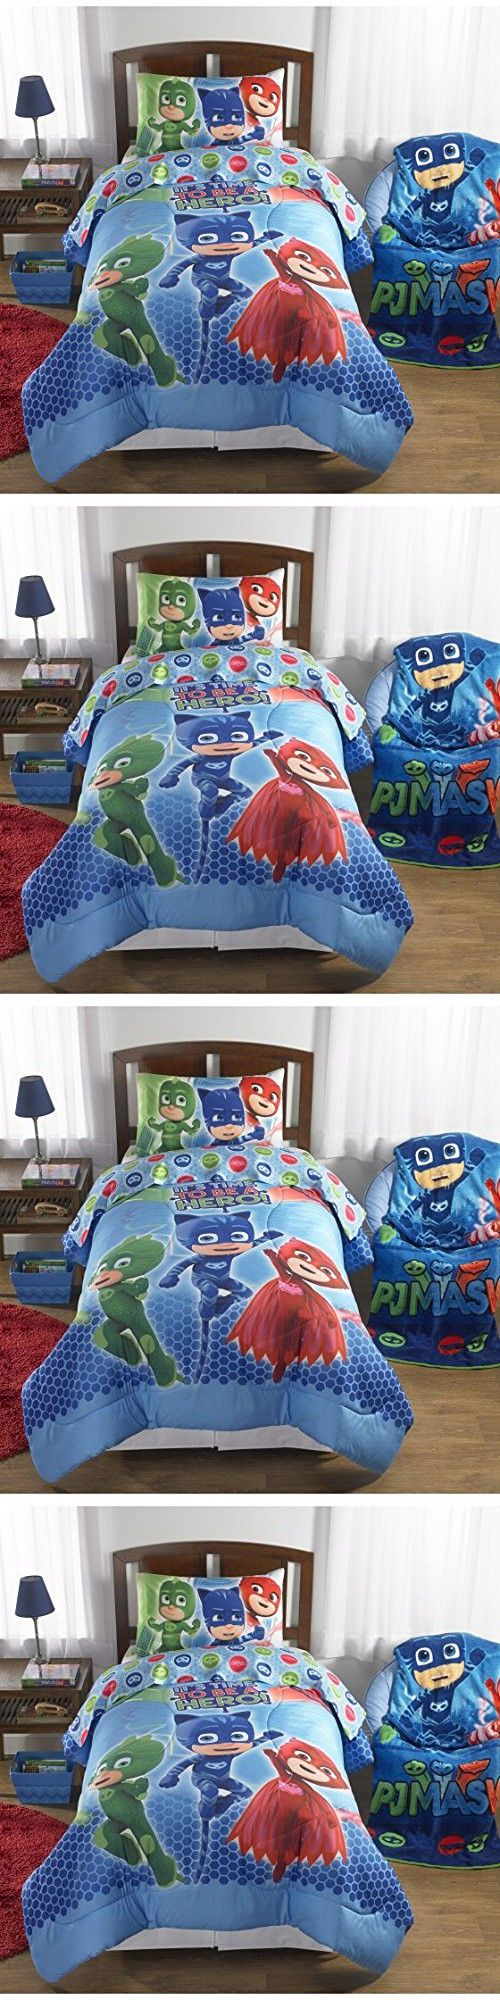 L&M 4 Piece Kids Blue Red PJ Mask Comforter Set Twin